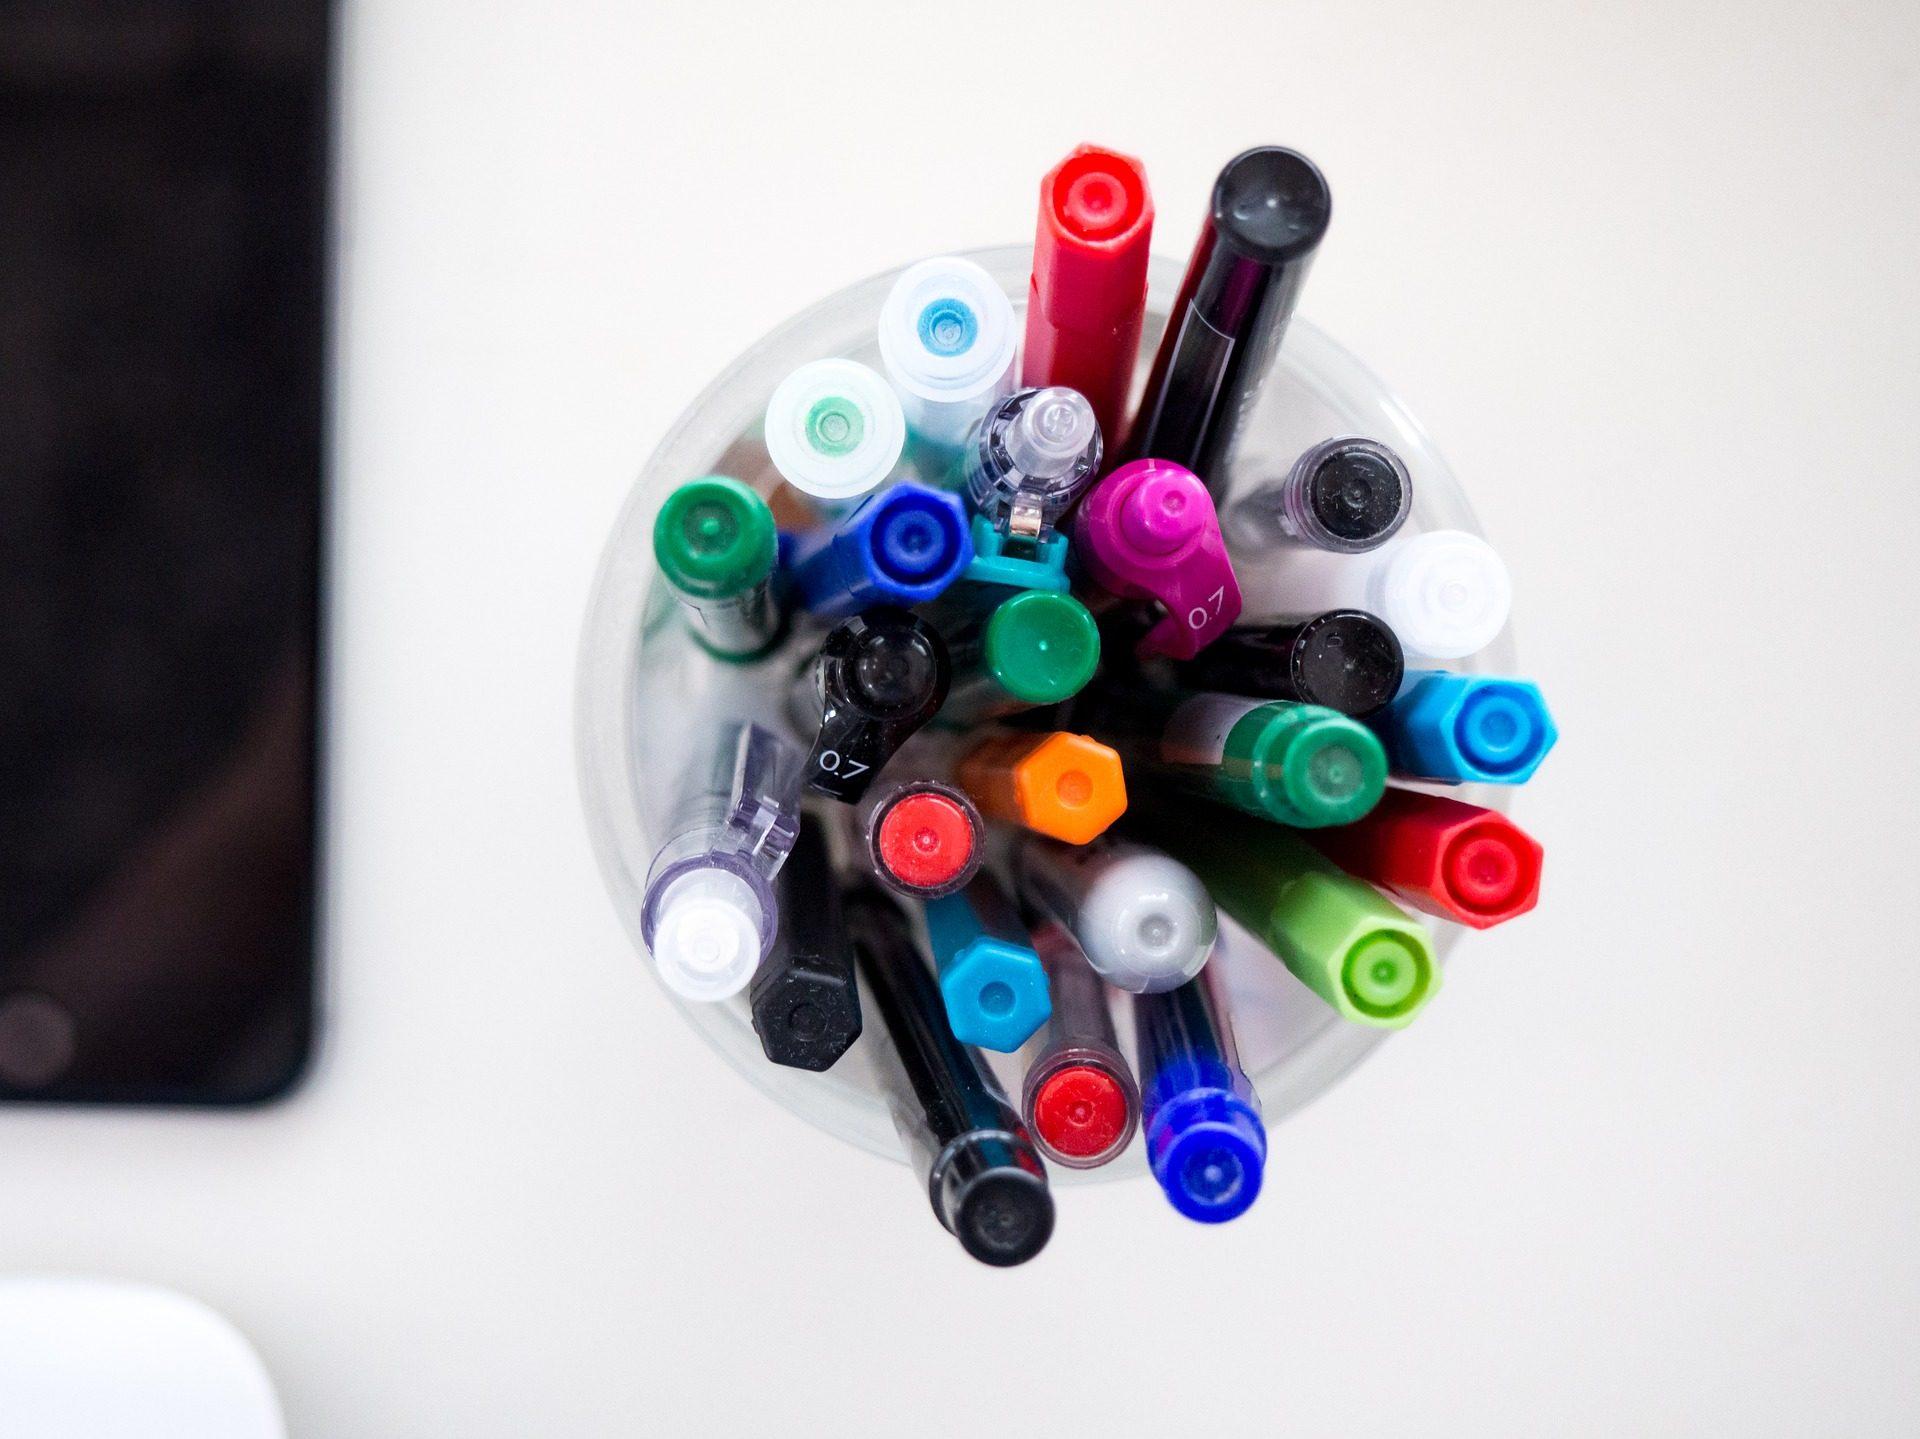 lapicero, χρώματα, Ανεστυλό�ι Μαρκαδόροι, bolígrafos, πολλά, πολύχρωμο - Wallpapers HD - Professor-falken.com